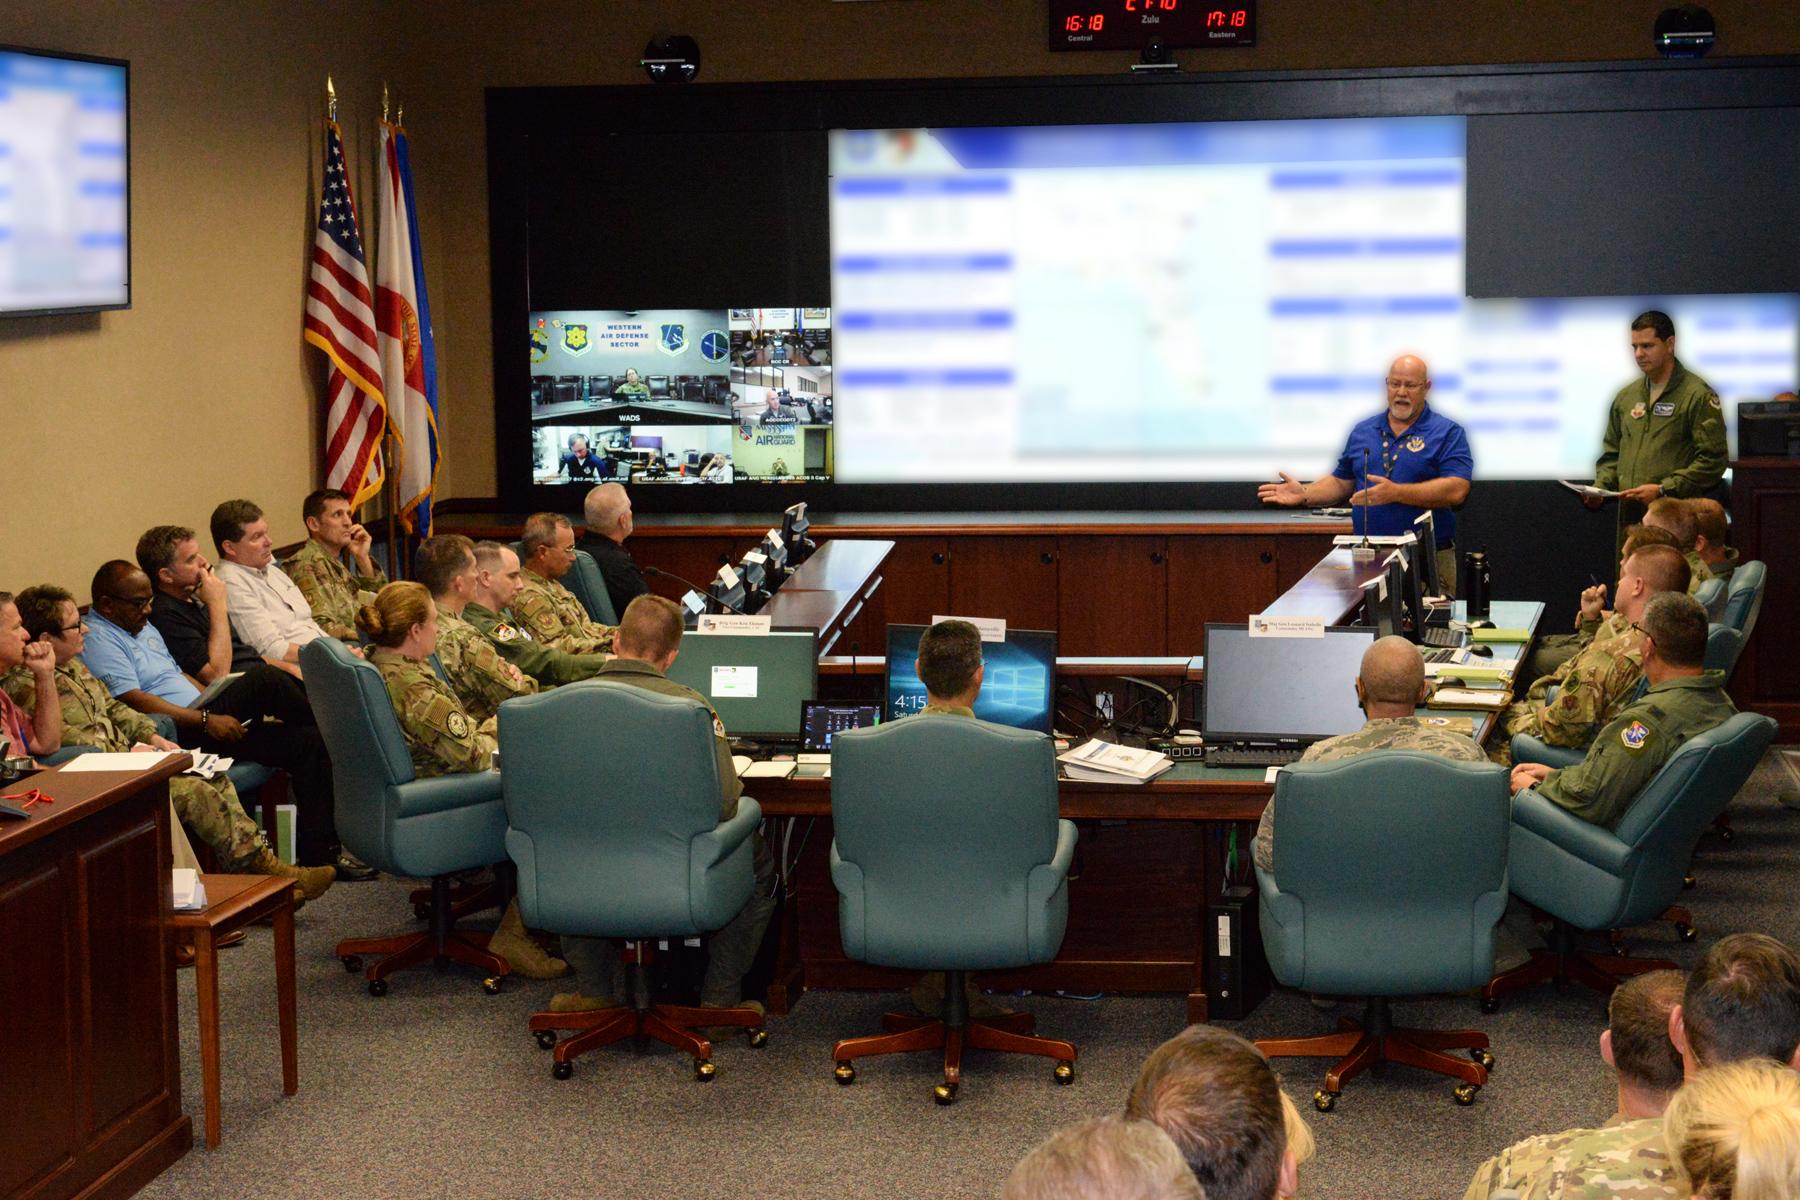 Hurricane Preparation Changing at Florida Air Force Bases